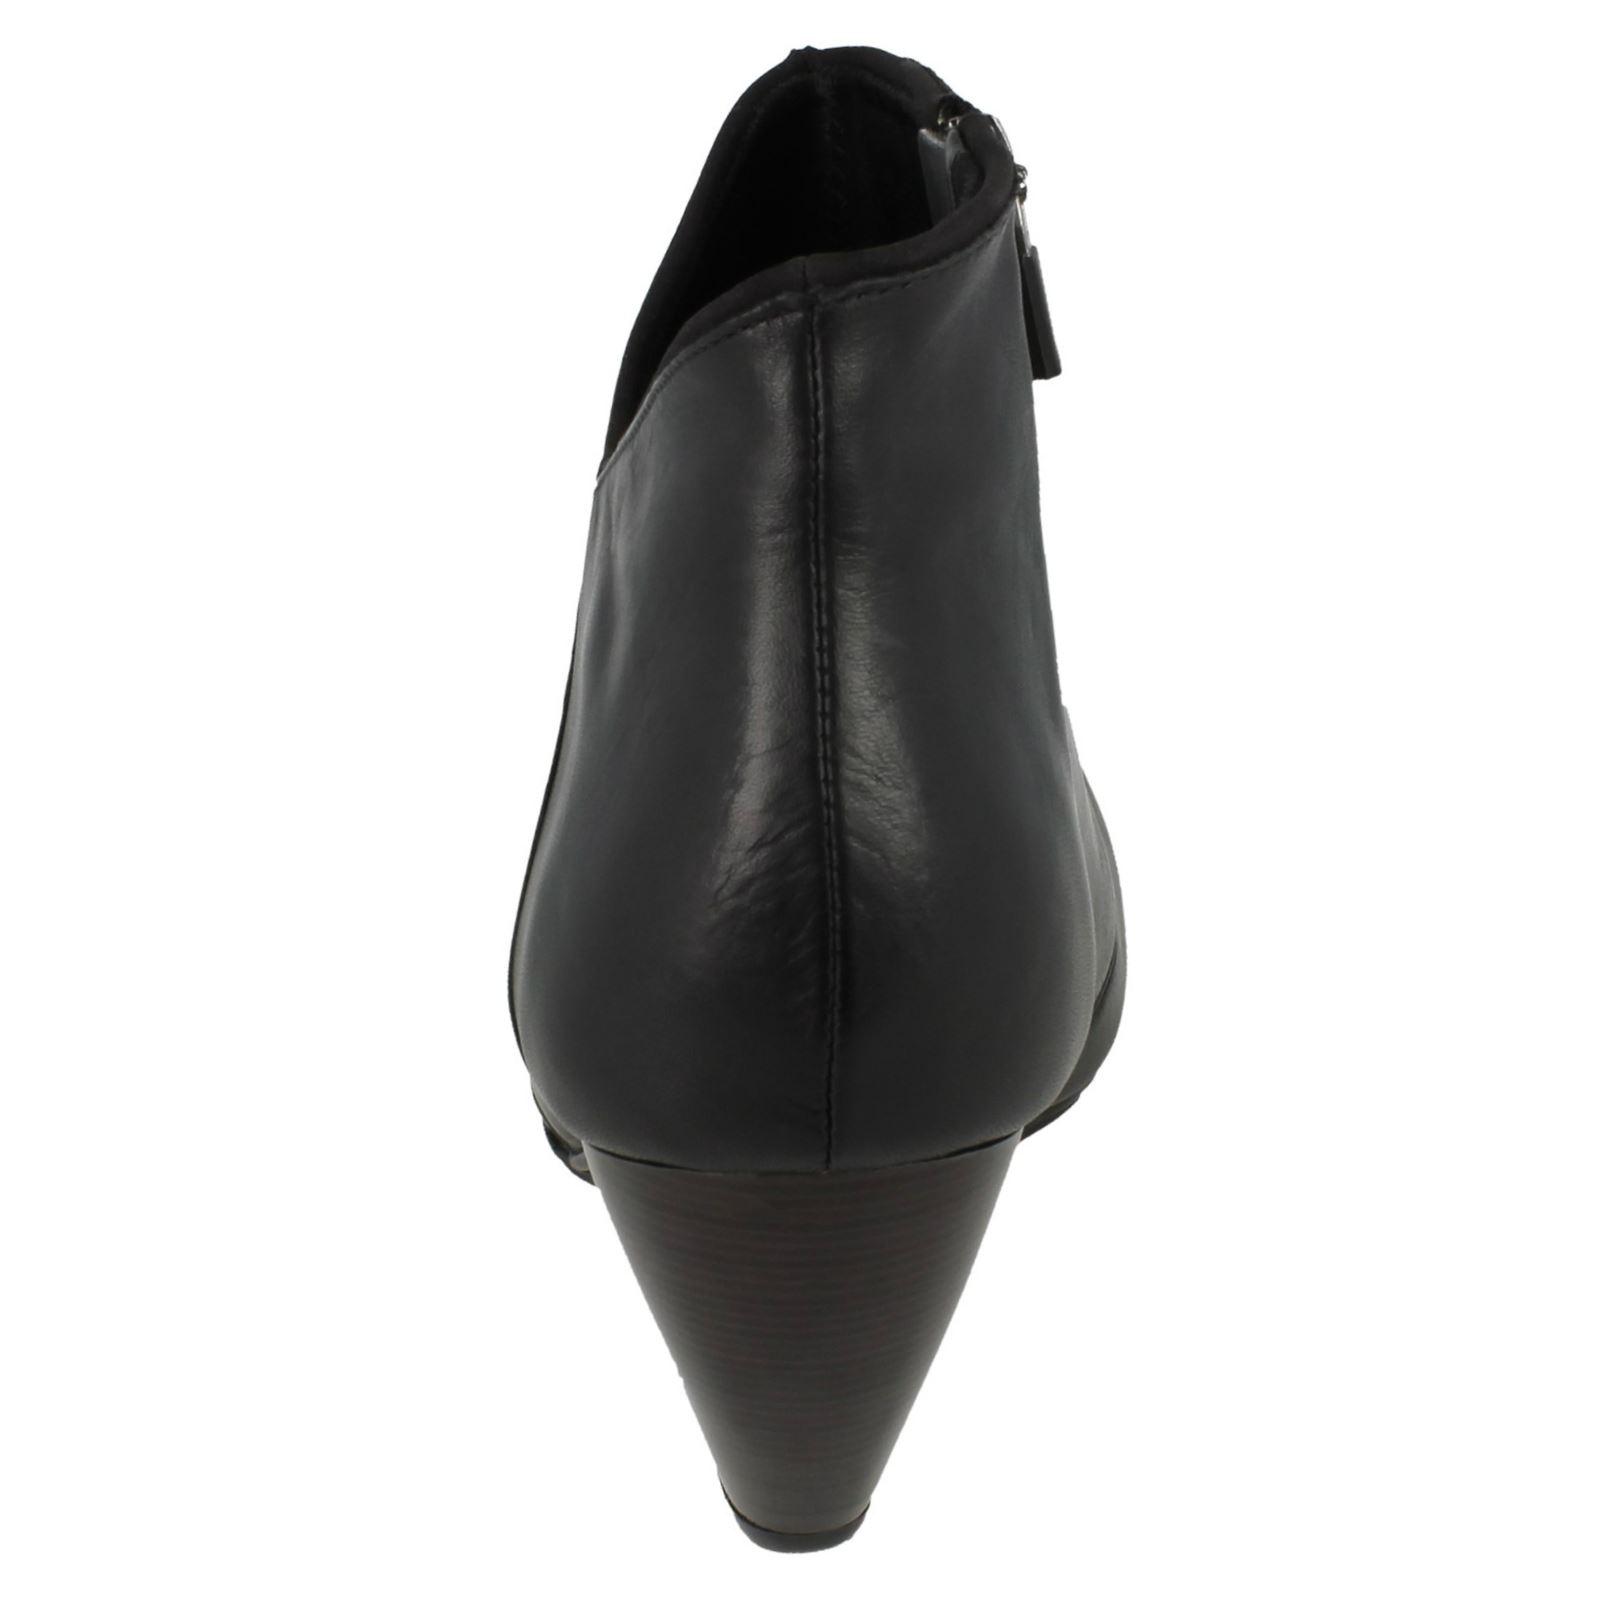 Botas al tobillo Damas Clarks Etiqueta softwear 'Lula cualquier' Etiqueta Clarks ~ K 3b221c